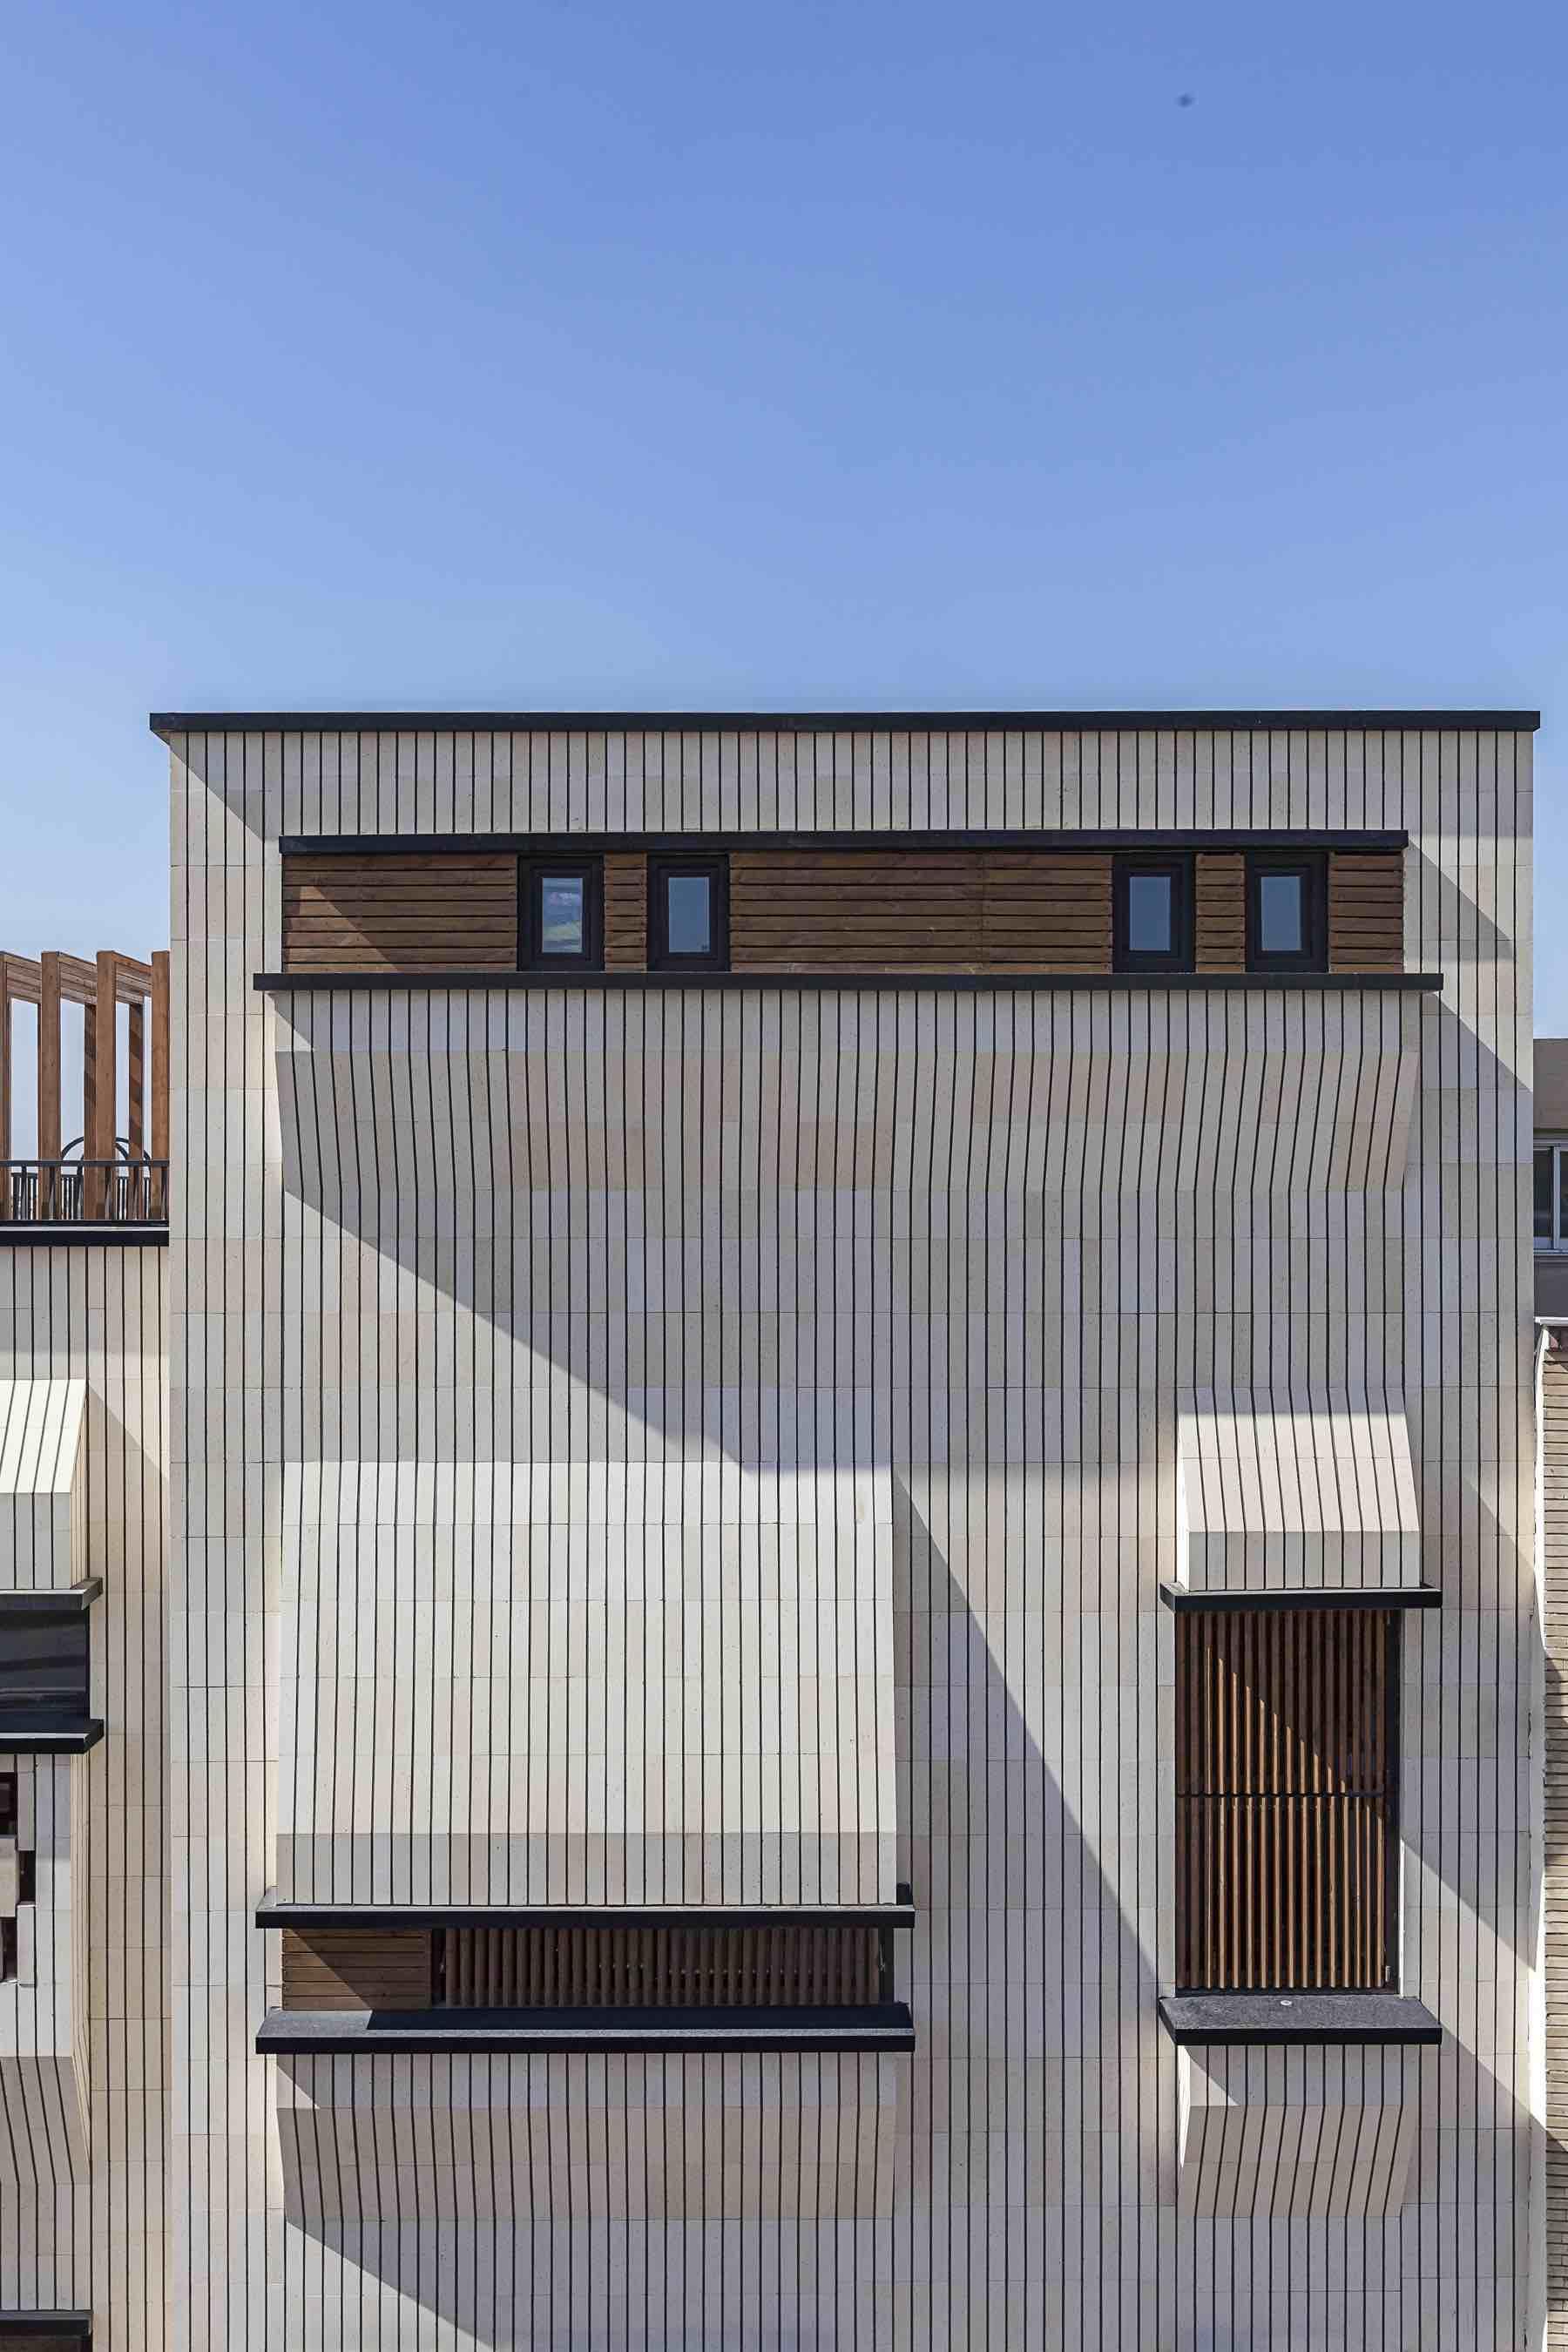 Rouzan_Residential_Building_Sayed_hamed_jafari_Charchoob_Architecture_Office_006.jpg